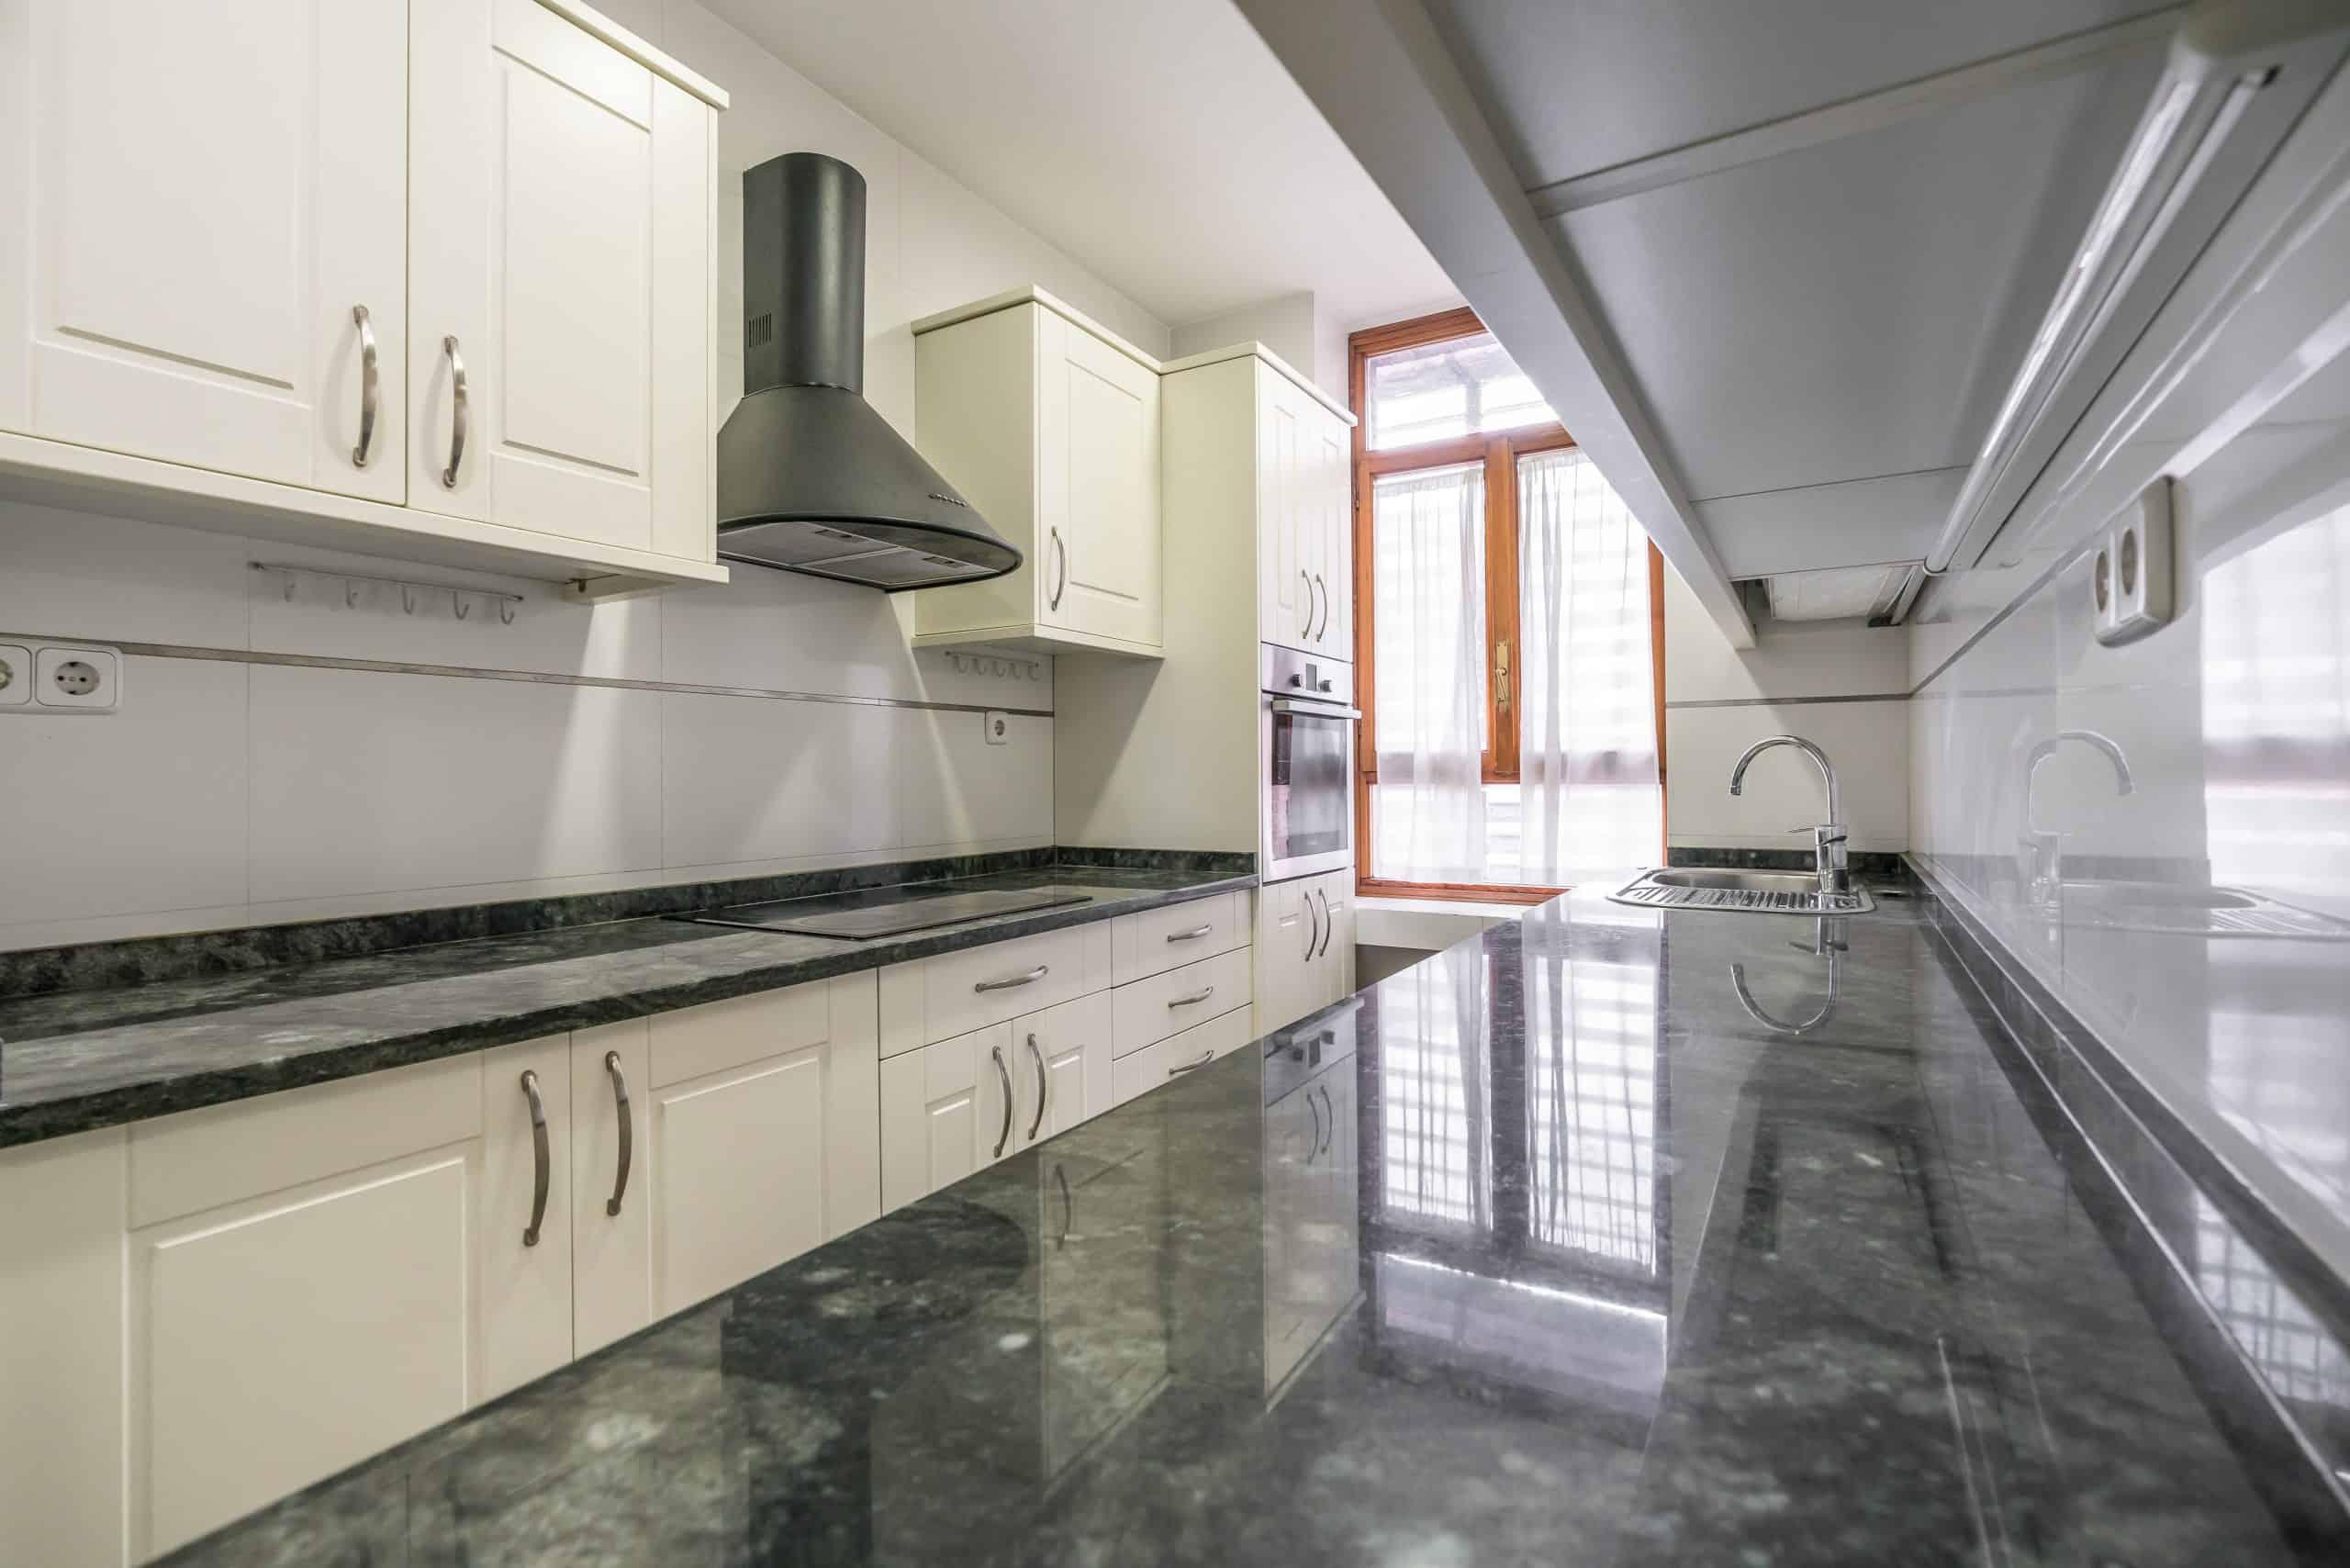 Agencia Inmobiliaria de Madrid-FUTUROCASA-Zona ARGANZUELA-EMBAJADORES-LEGAZPI -calle Embajadores- baño 144